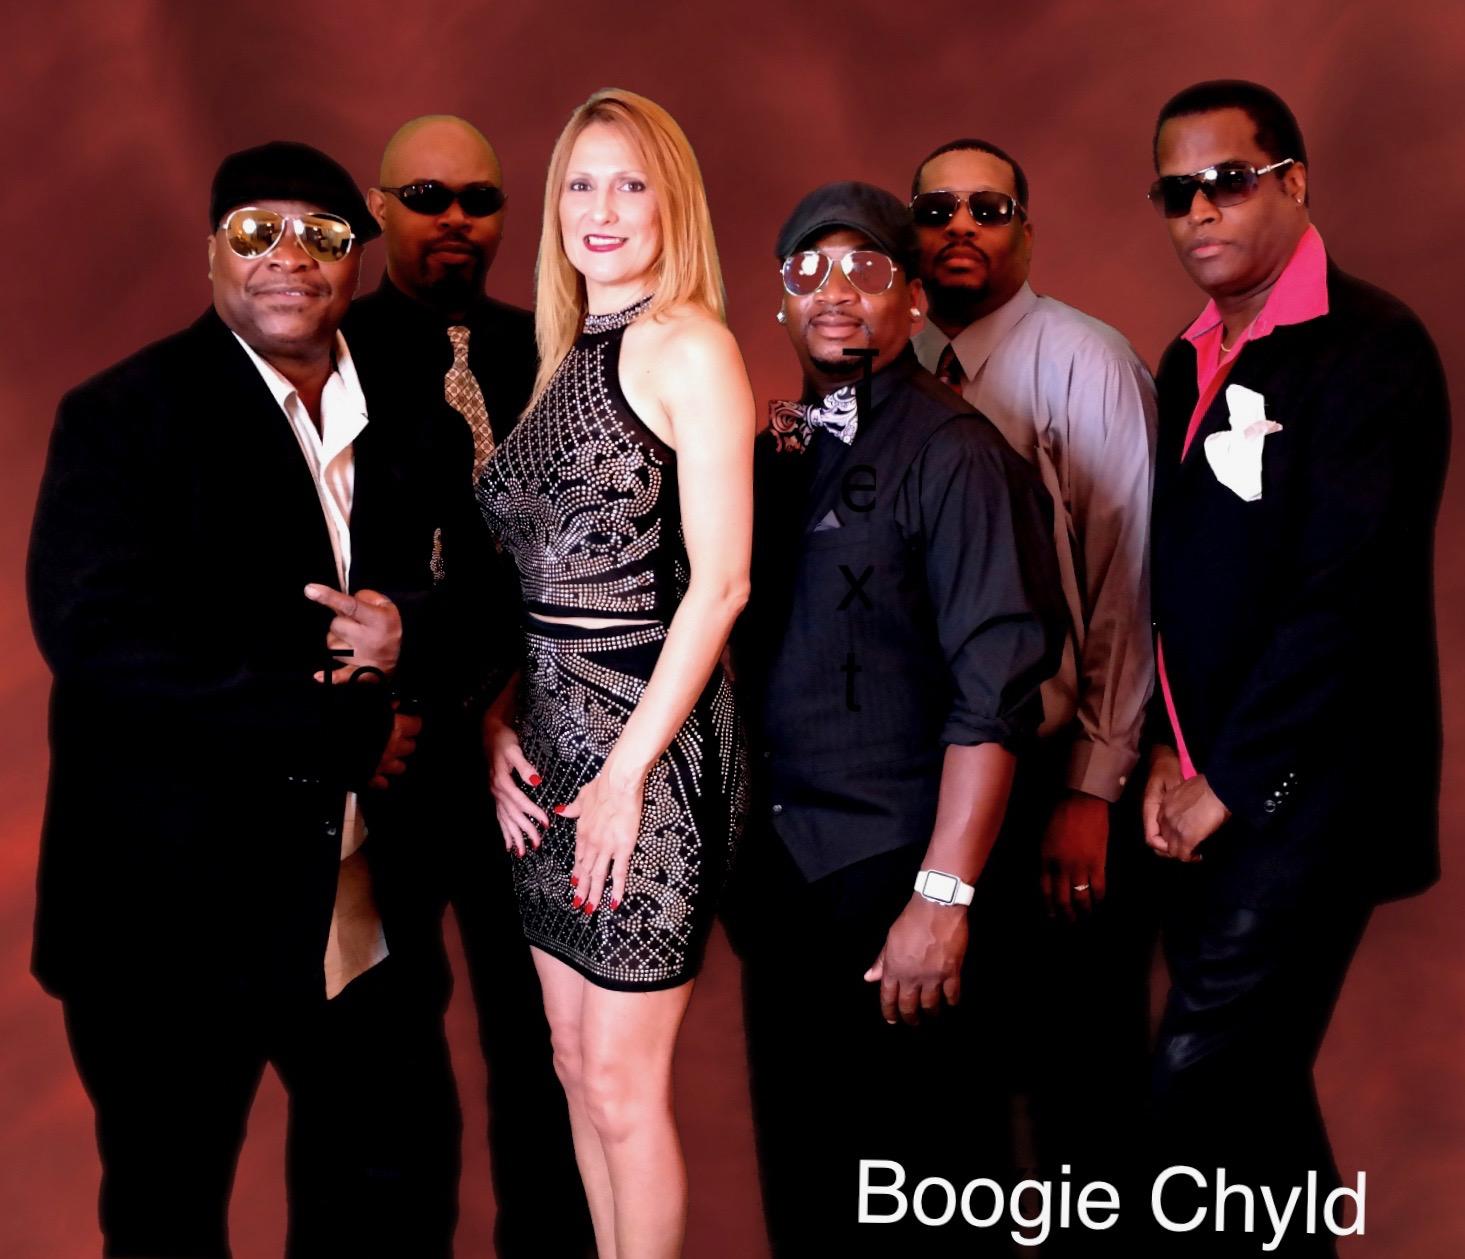 Boogie Chyld